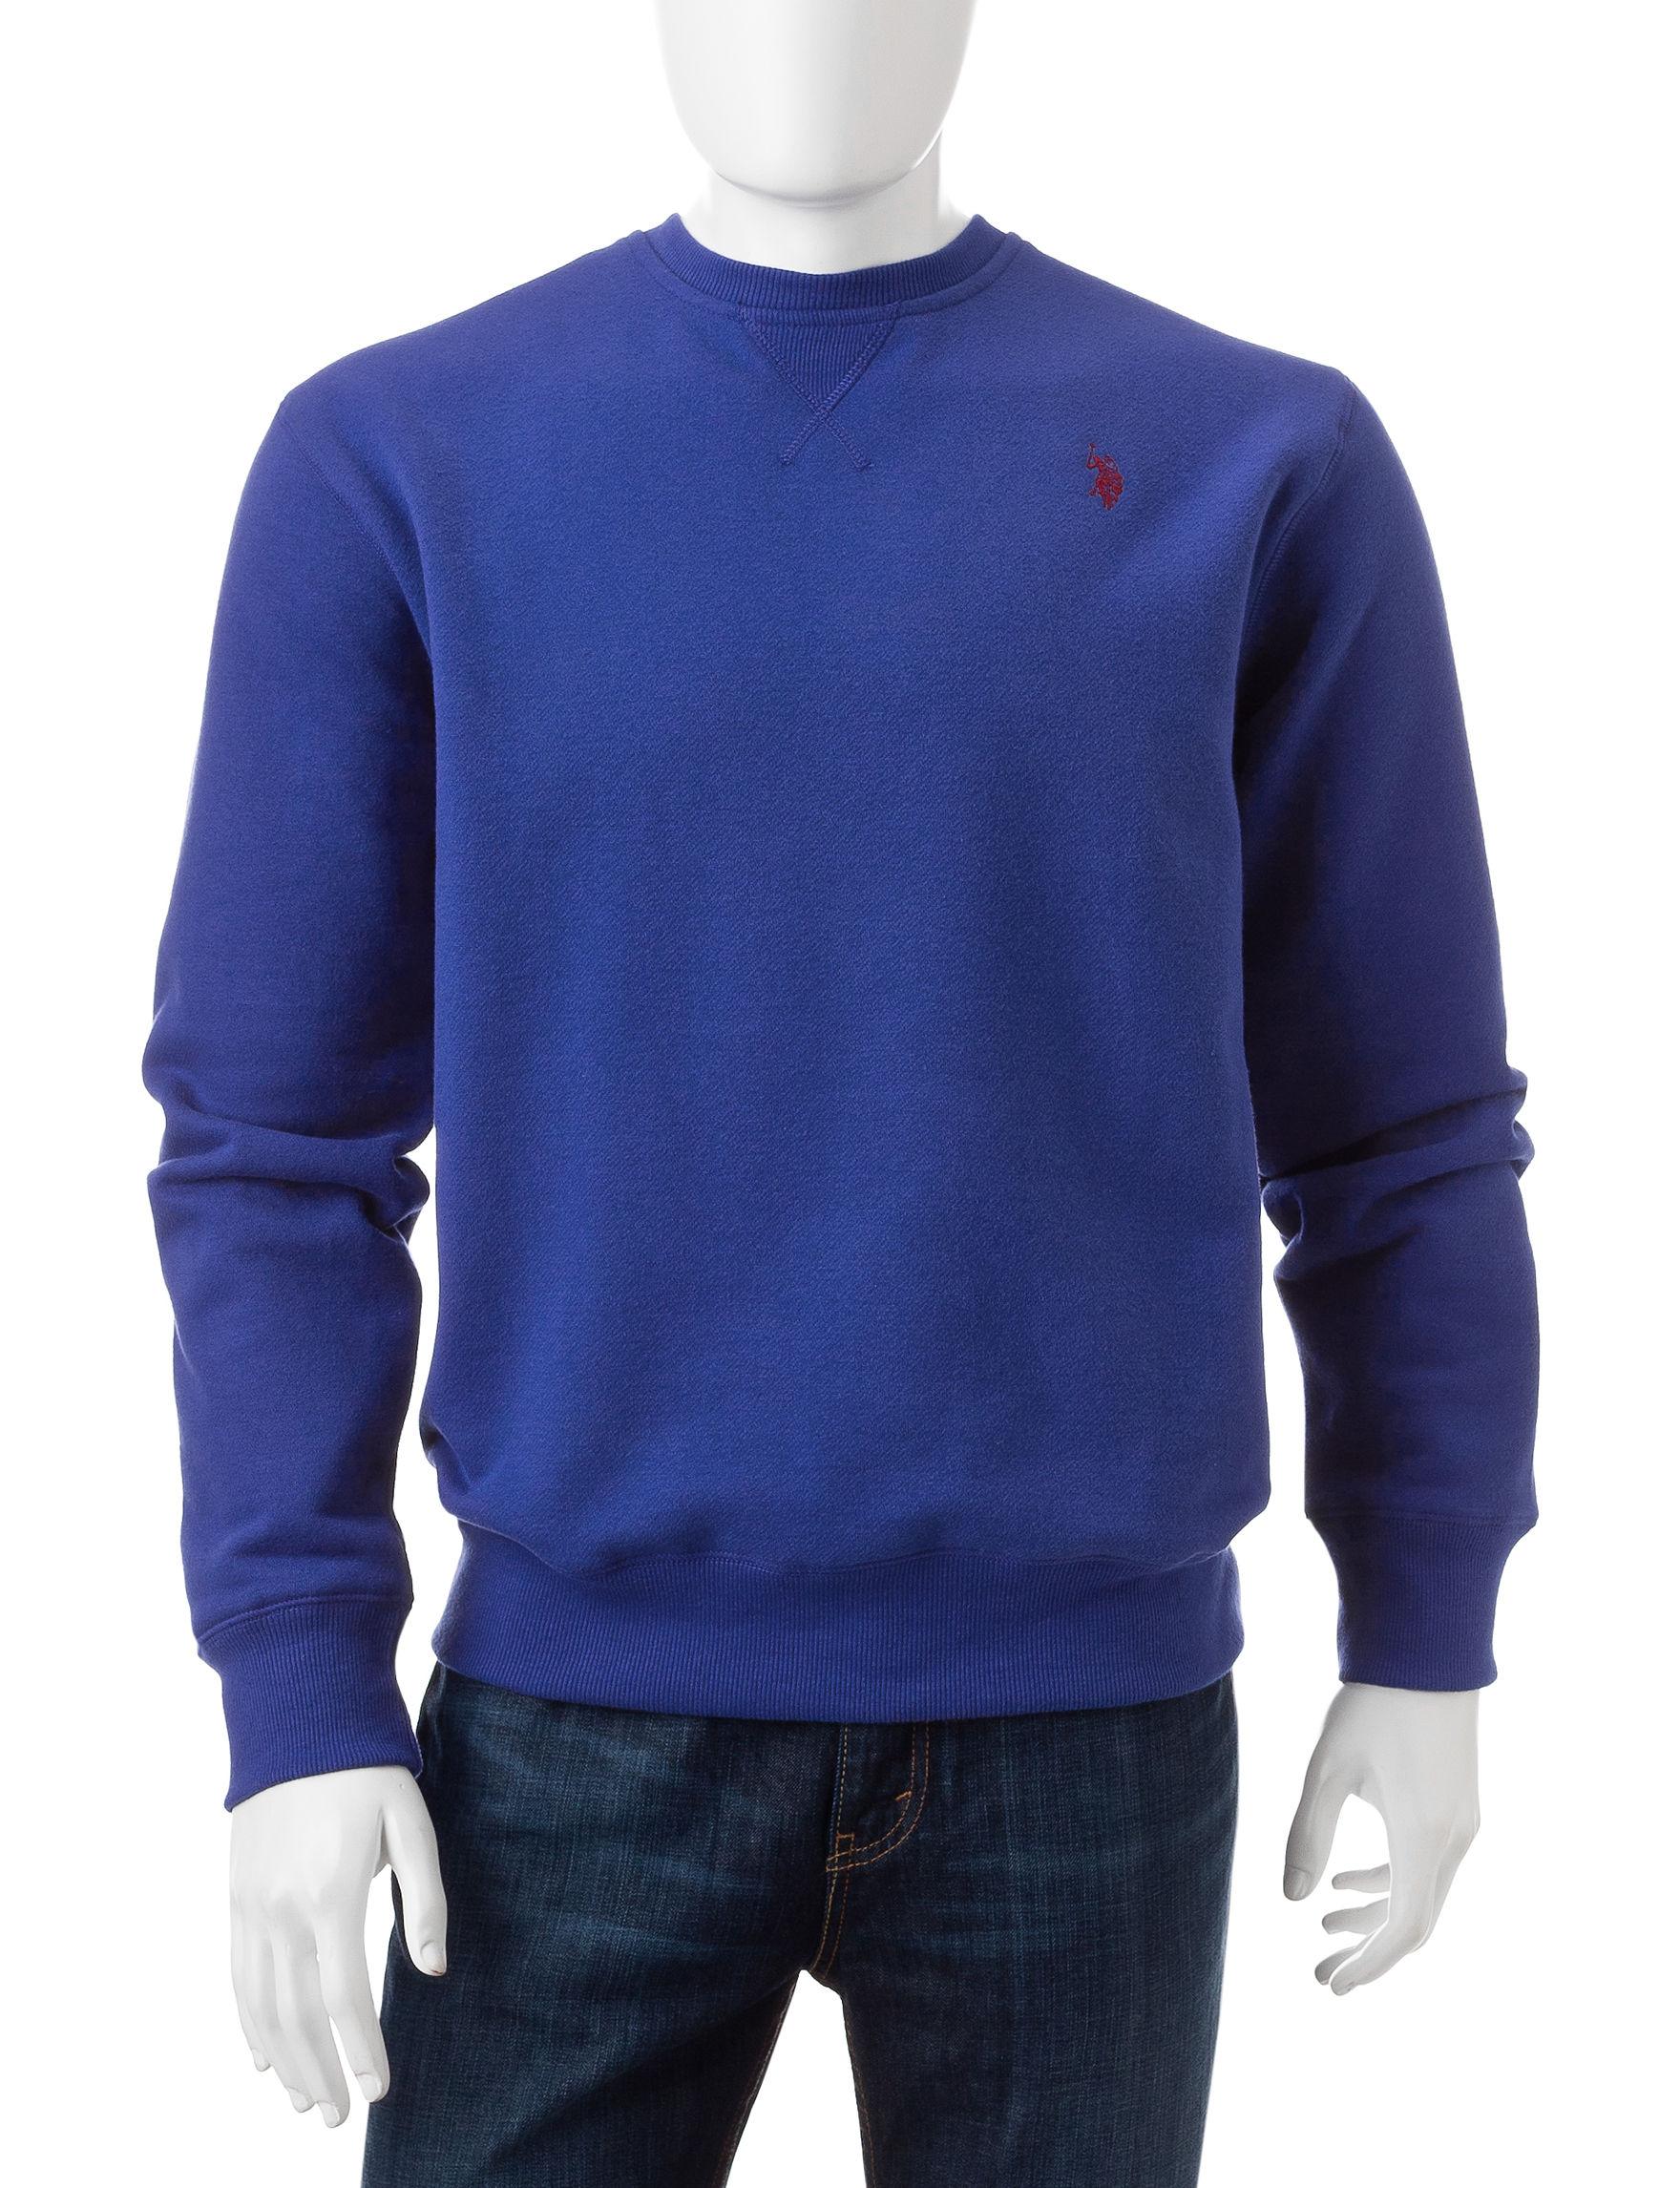 U.S. Polo Assn. Blue Pull-overs